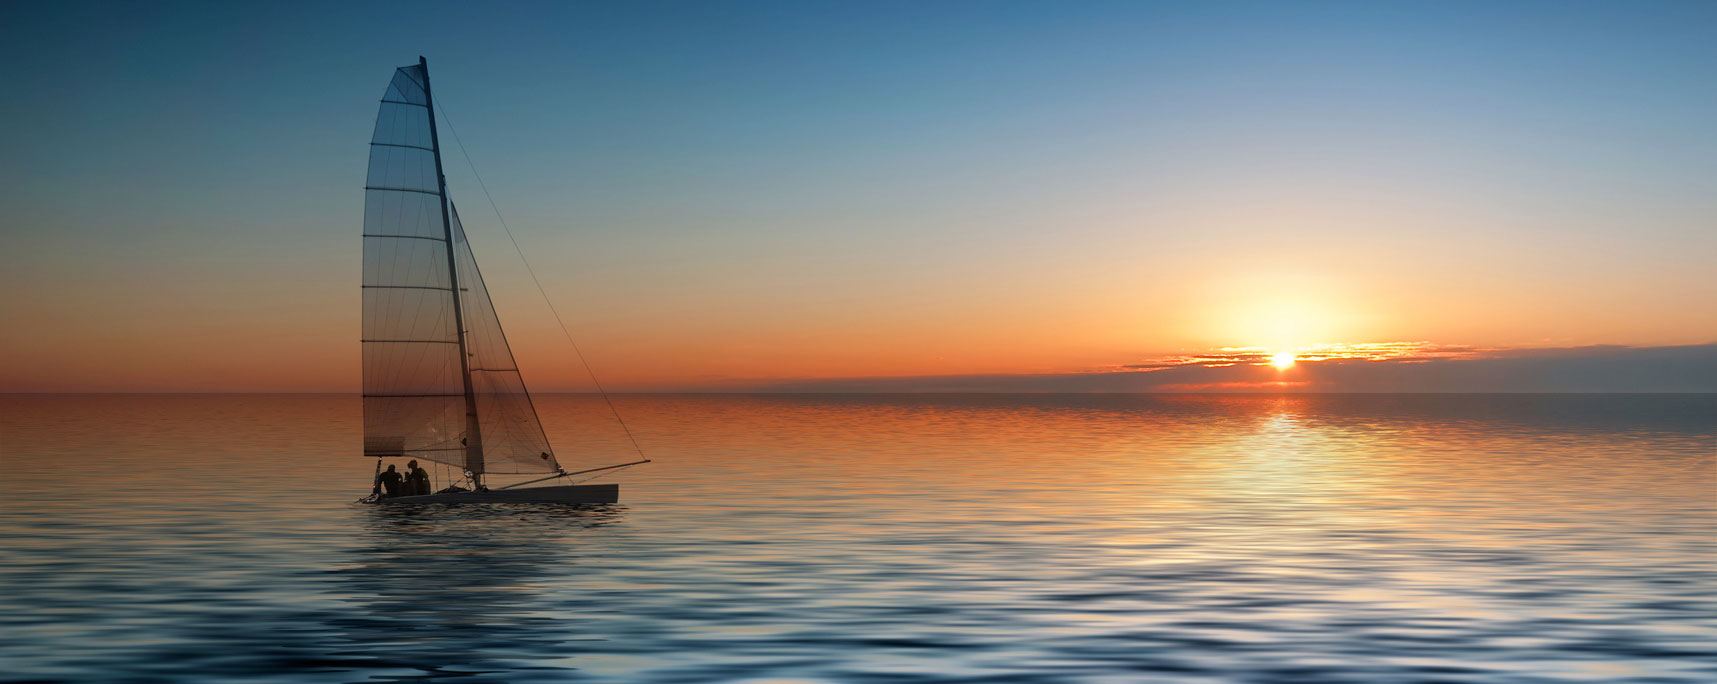 catamaran sonnenuntergang auf see header